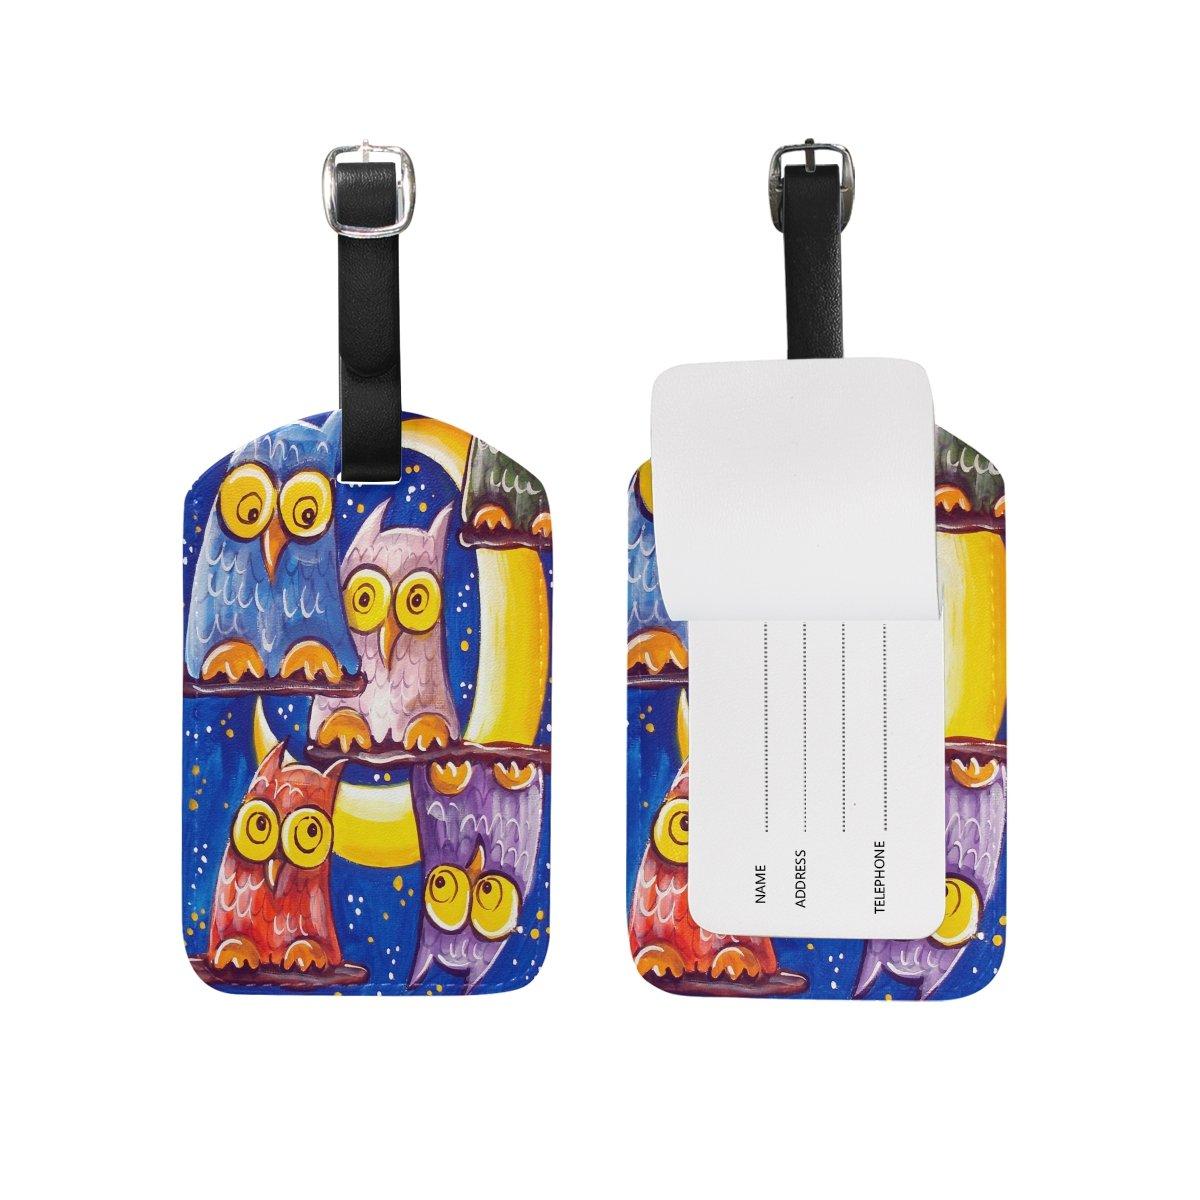 Saobao Travel Luggage Tag Crowd Of Owls PU Leather Baggage Travel ID